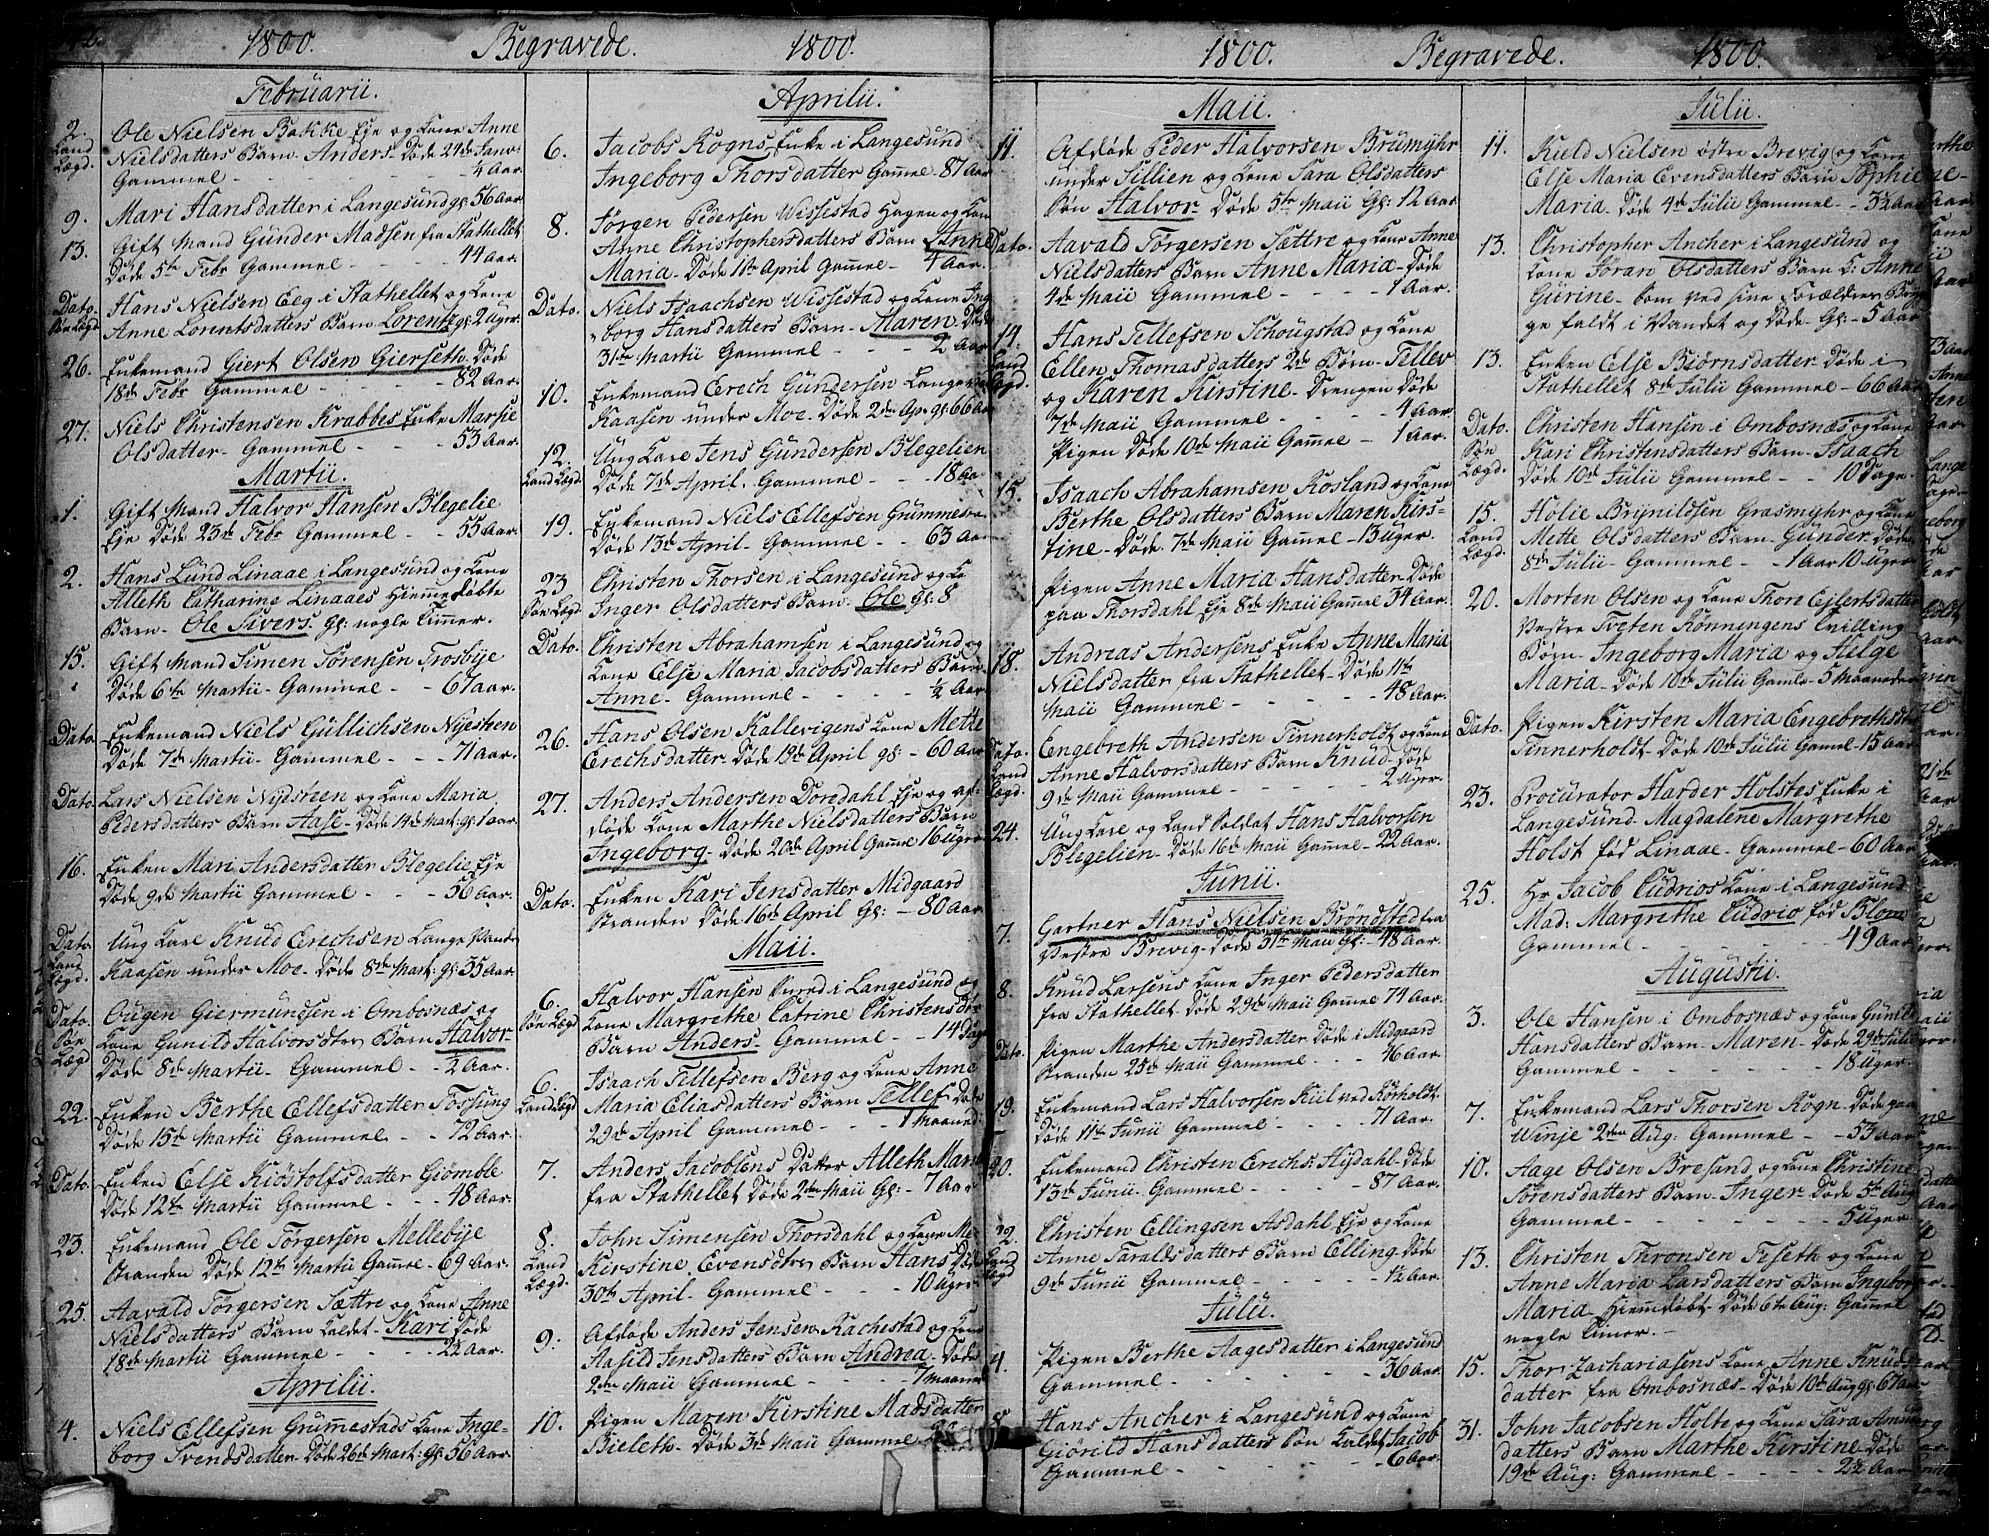 SAKO, Bamble kirkebøker, F/Fa/L0002: Ministerialbok nr. I 2, 1775-1814, s. 542-543